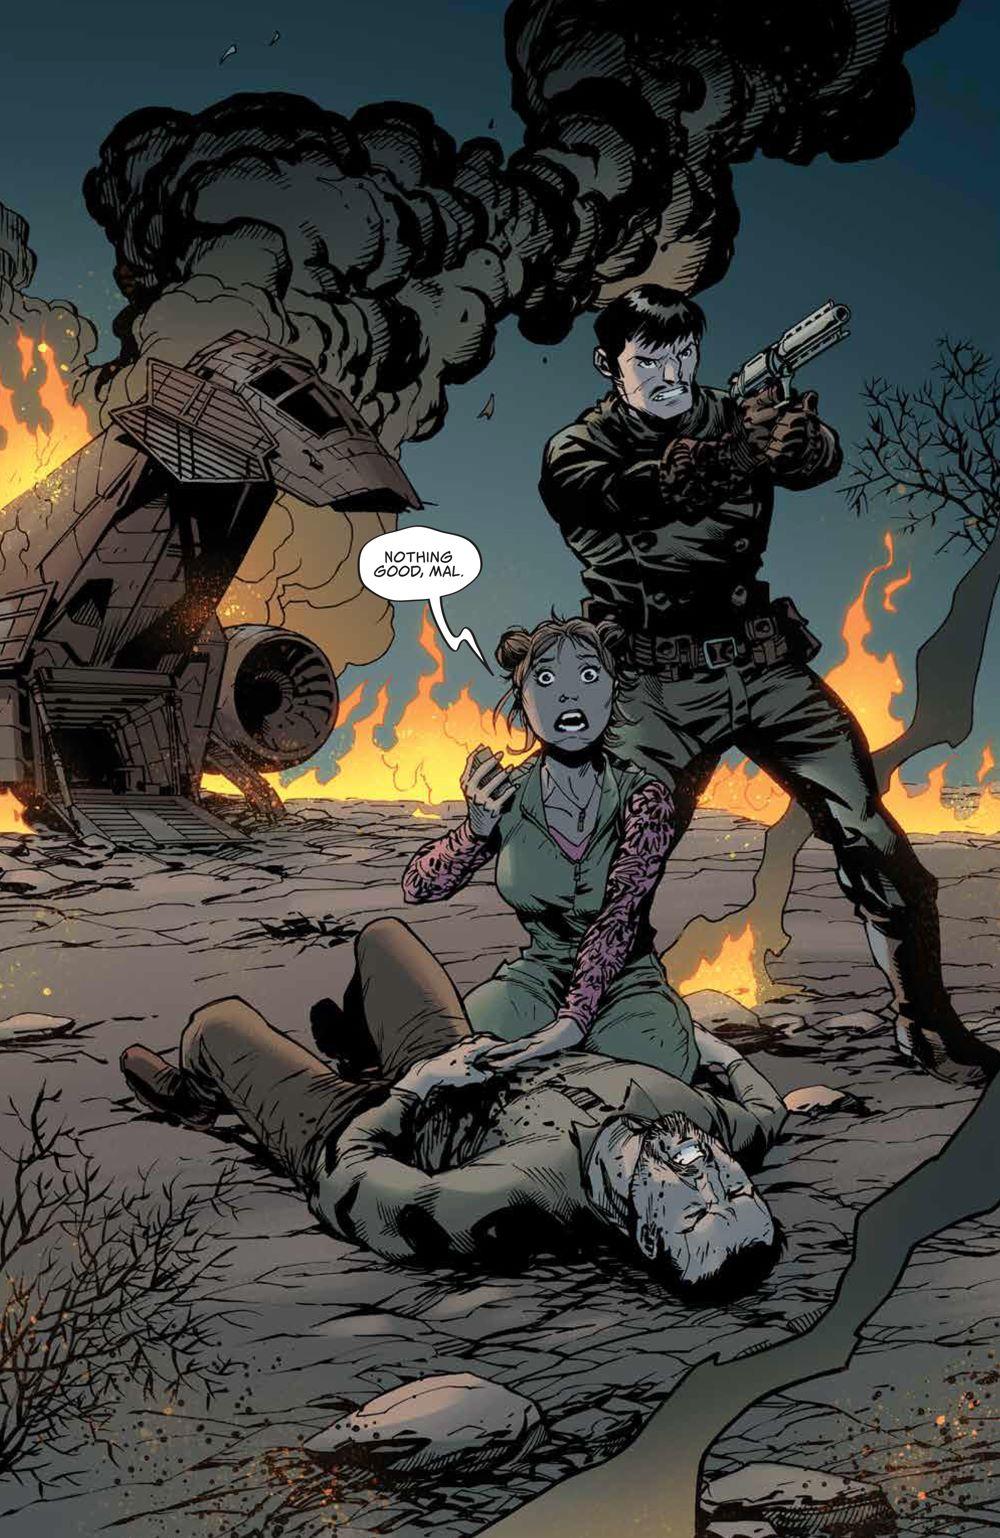 Firefly_NewSheriffVerse_v2_HC_PRESS_20 ComicList Previews: FIREFLY NEW SHERIFF IN THE 'VERSE VOLUME 2 HC